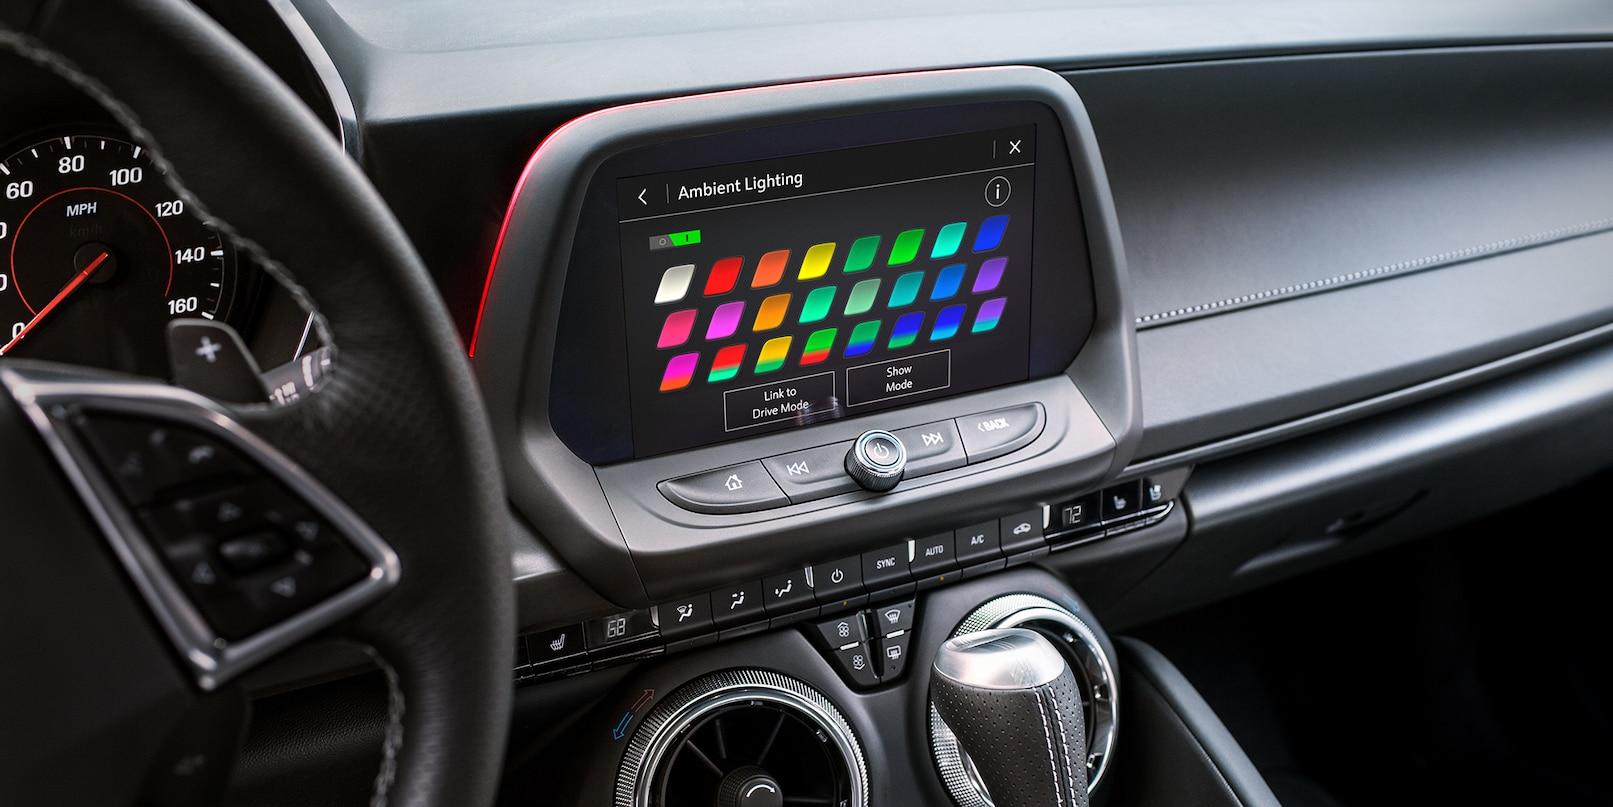 2019 Chevrolet Camaro Center Console